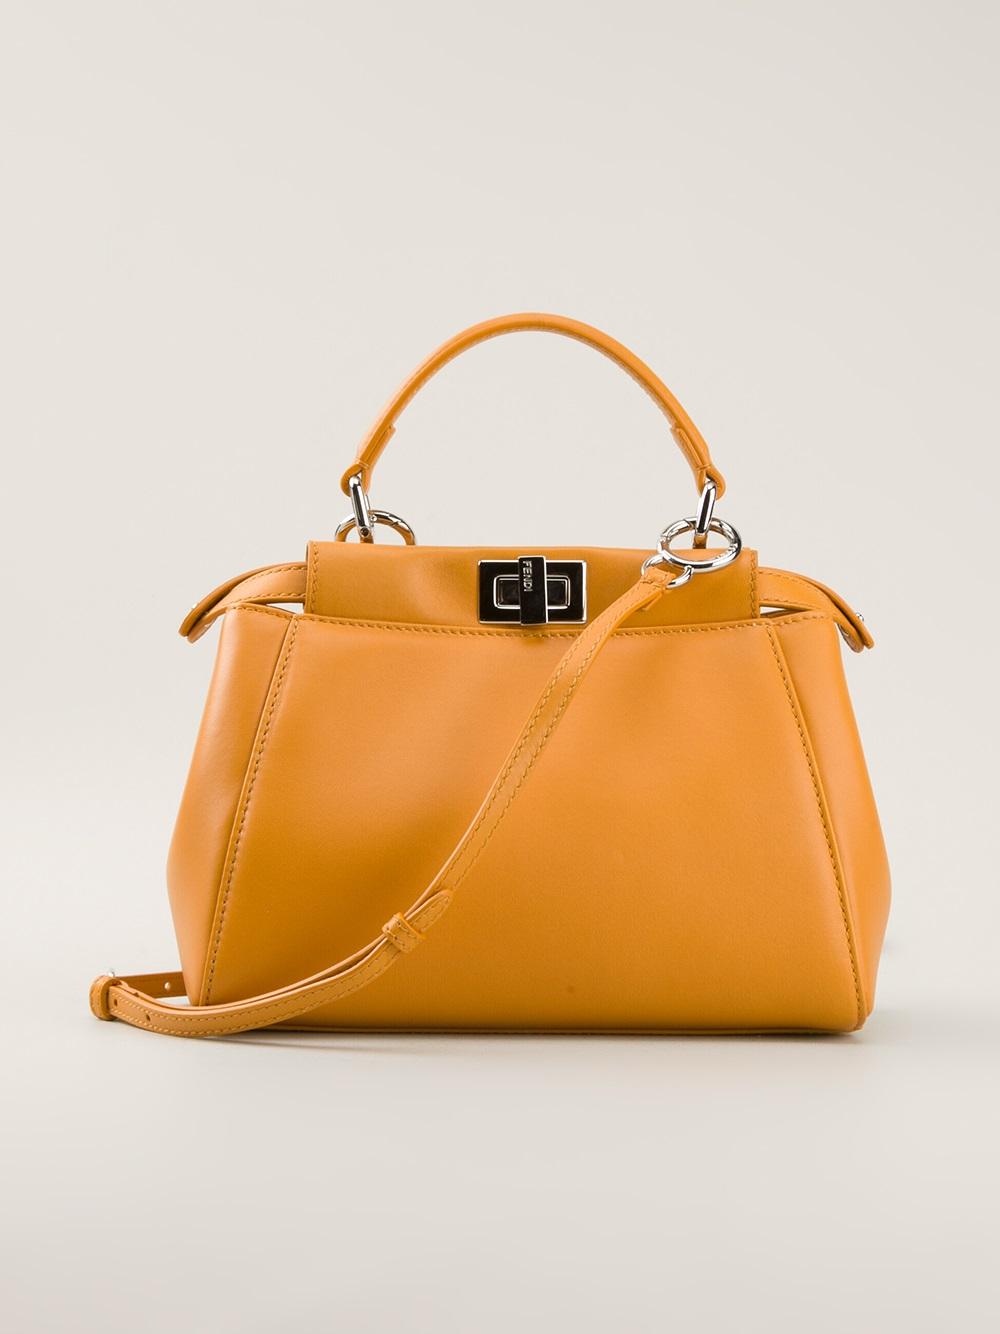 ... clearance fendi peekaboo small tote bag in yellow lyst 33bec a228b aed8ffea9f6d4